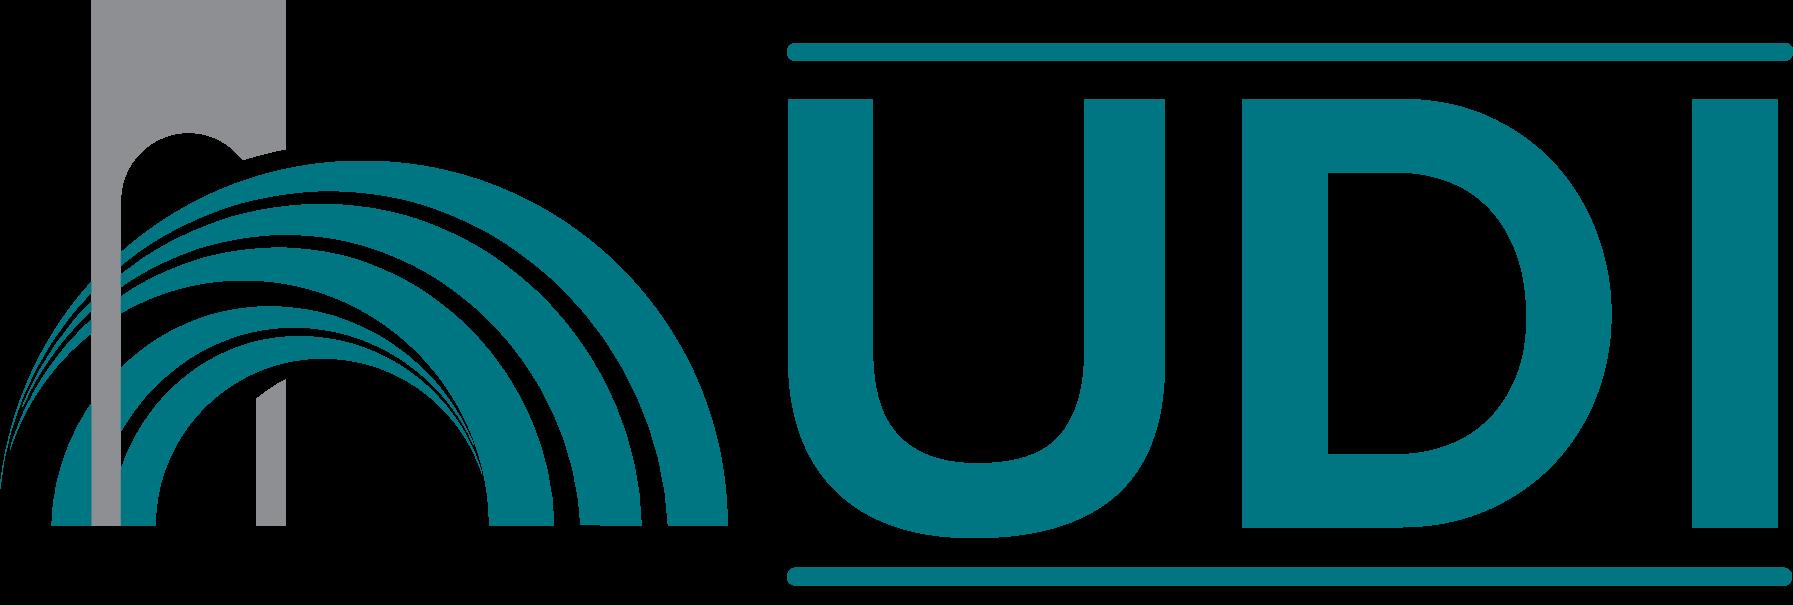 udigoldengatewayproject.com